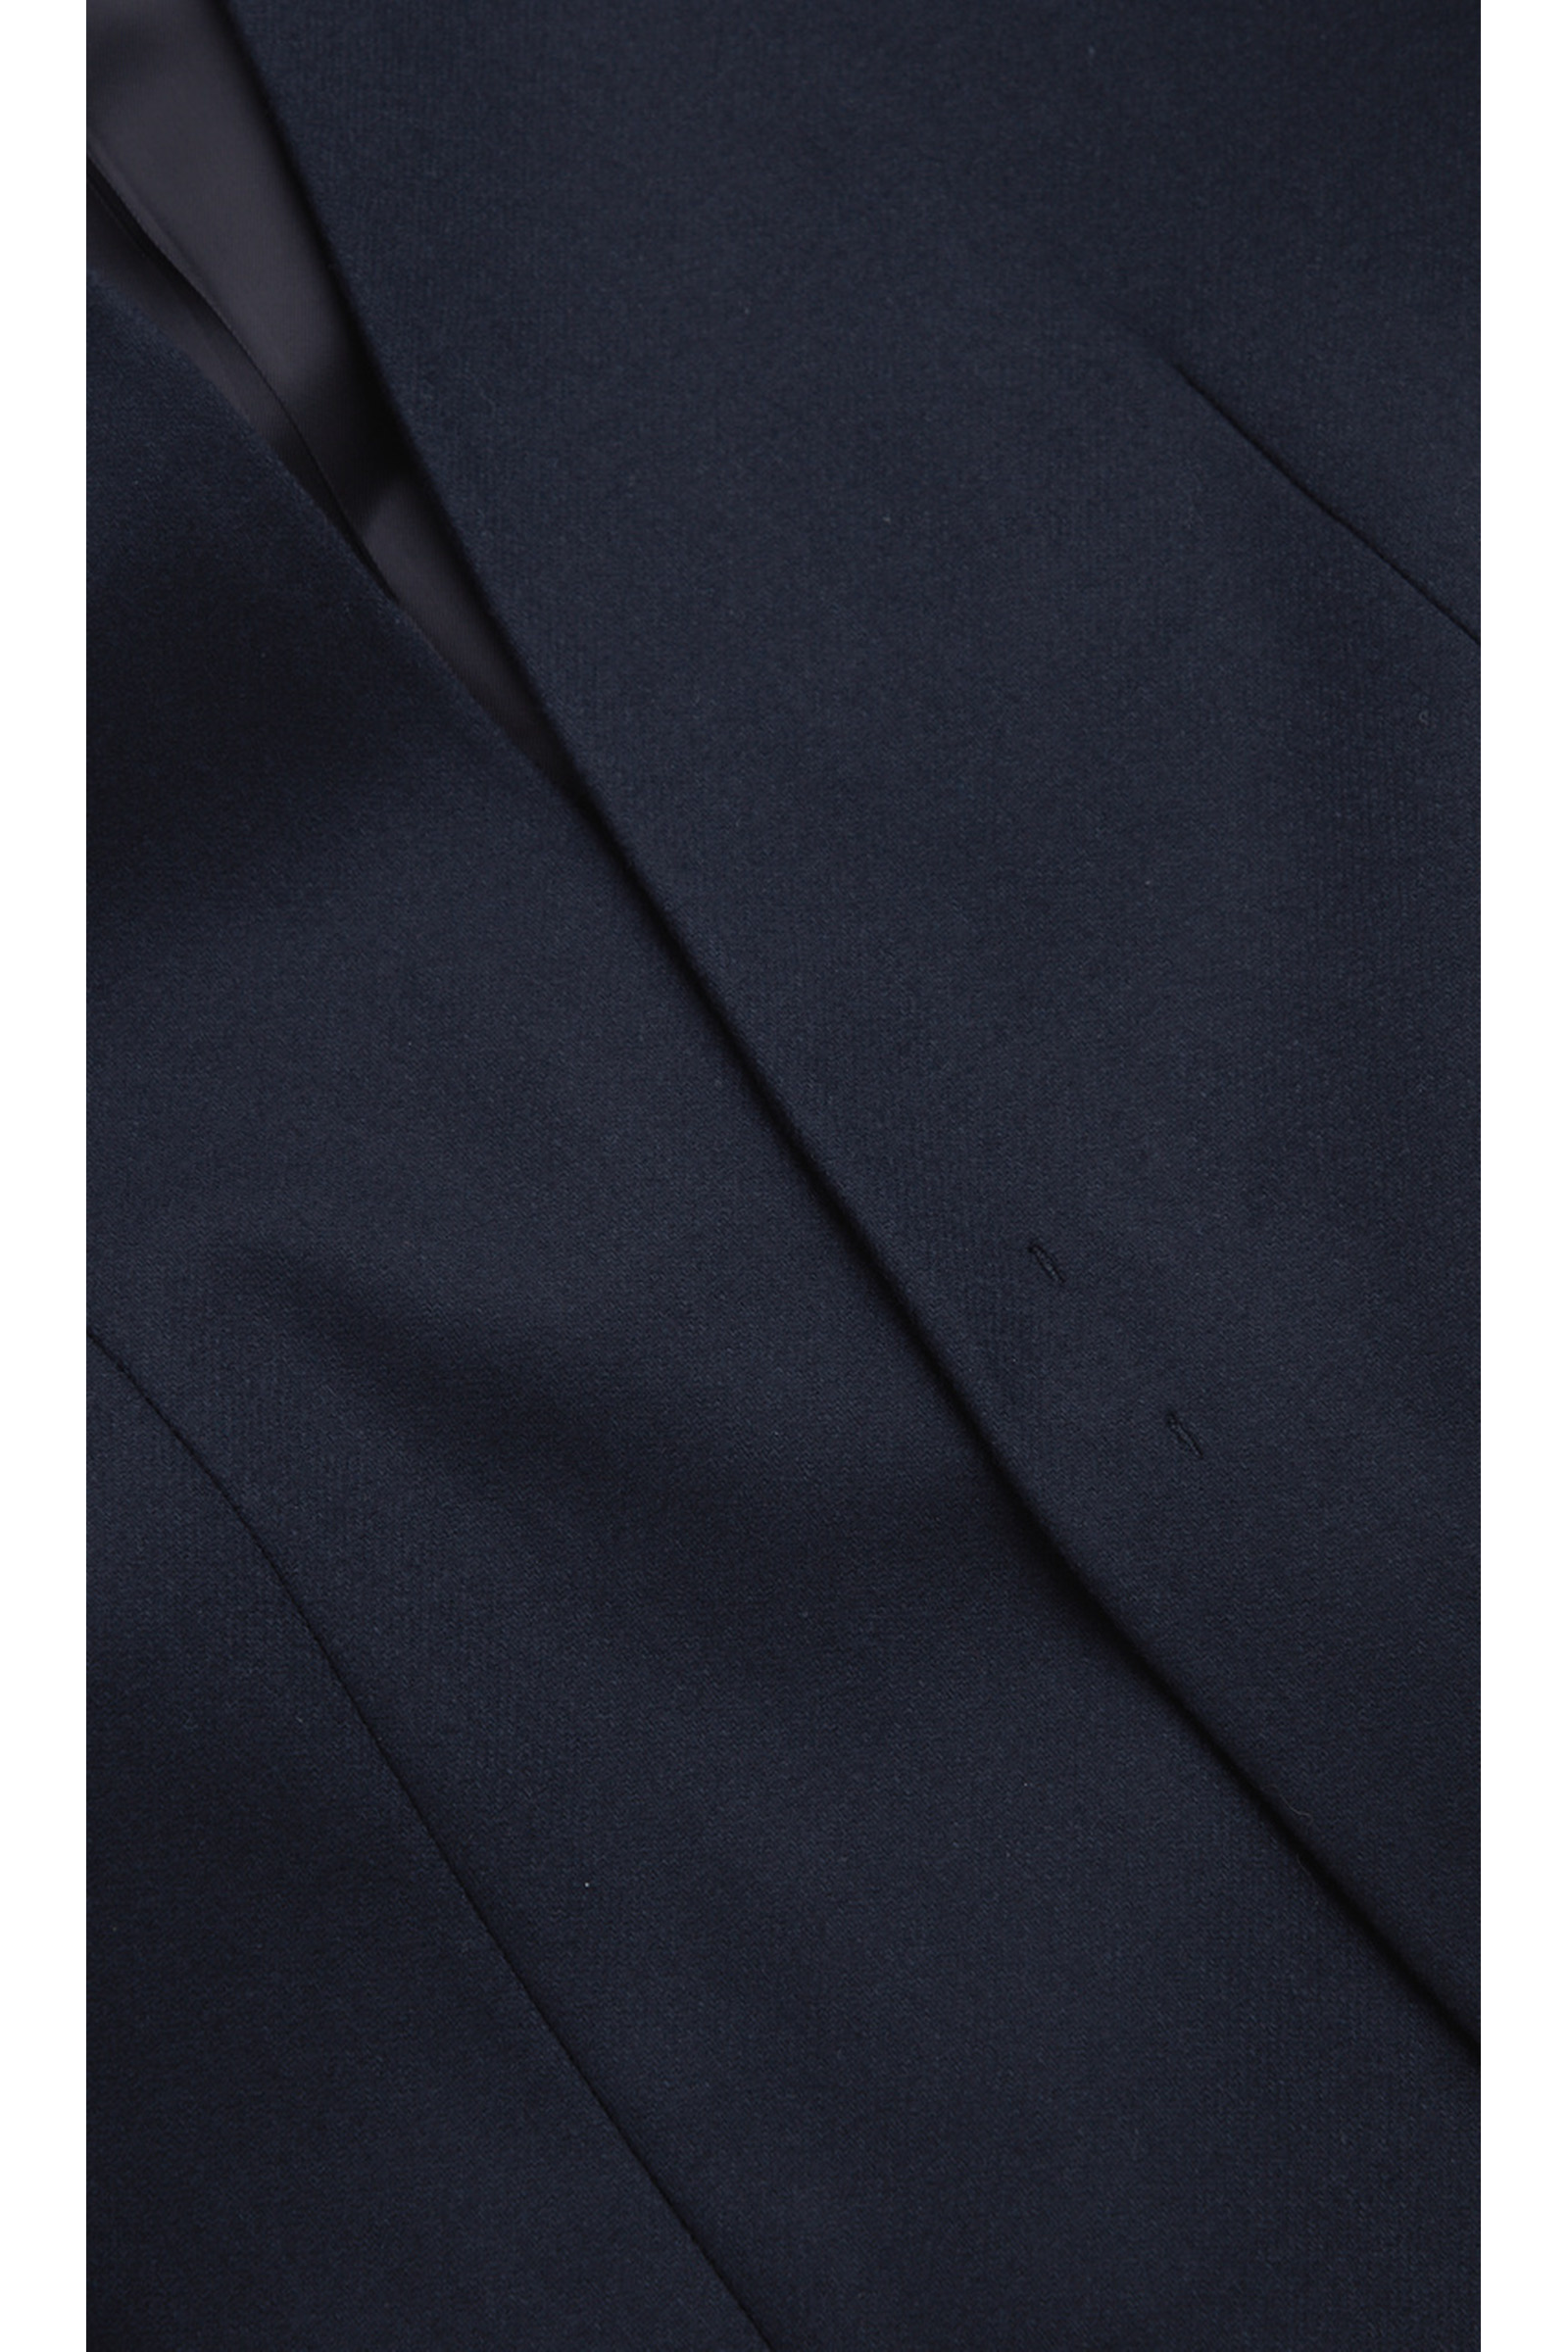 COS 캐시미어 울 믹스 칼라리스 블레이저의 네이비컬러 Detail입니다.